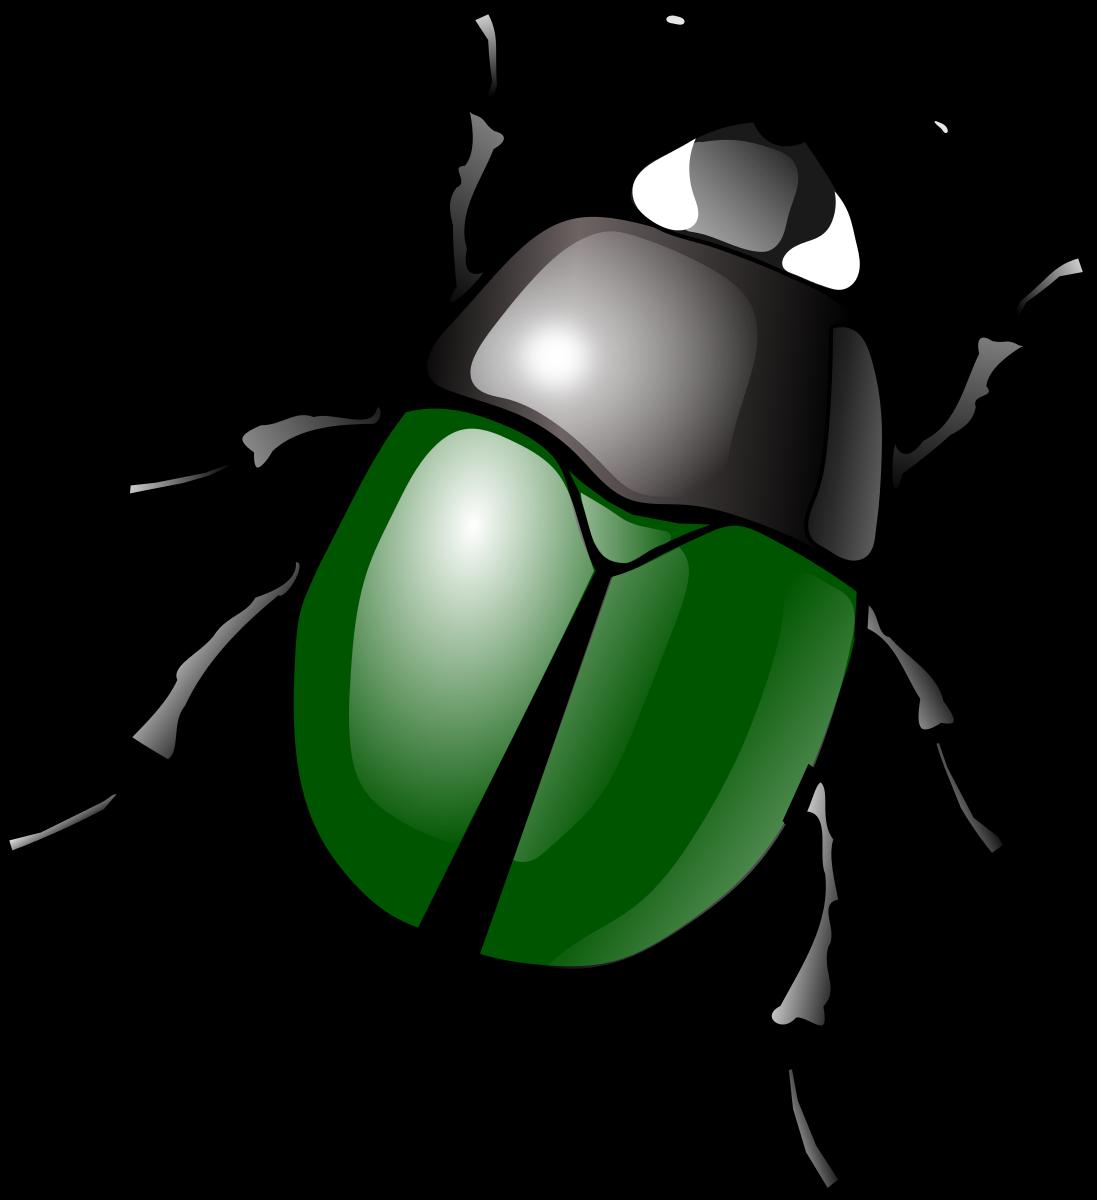 Beetle cliparts - Beetle Clipart